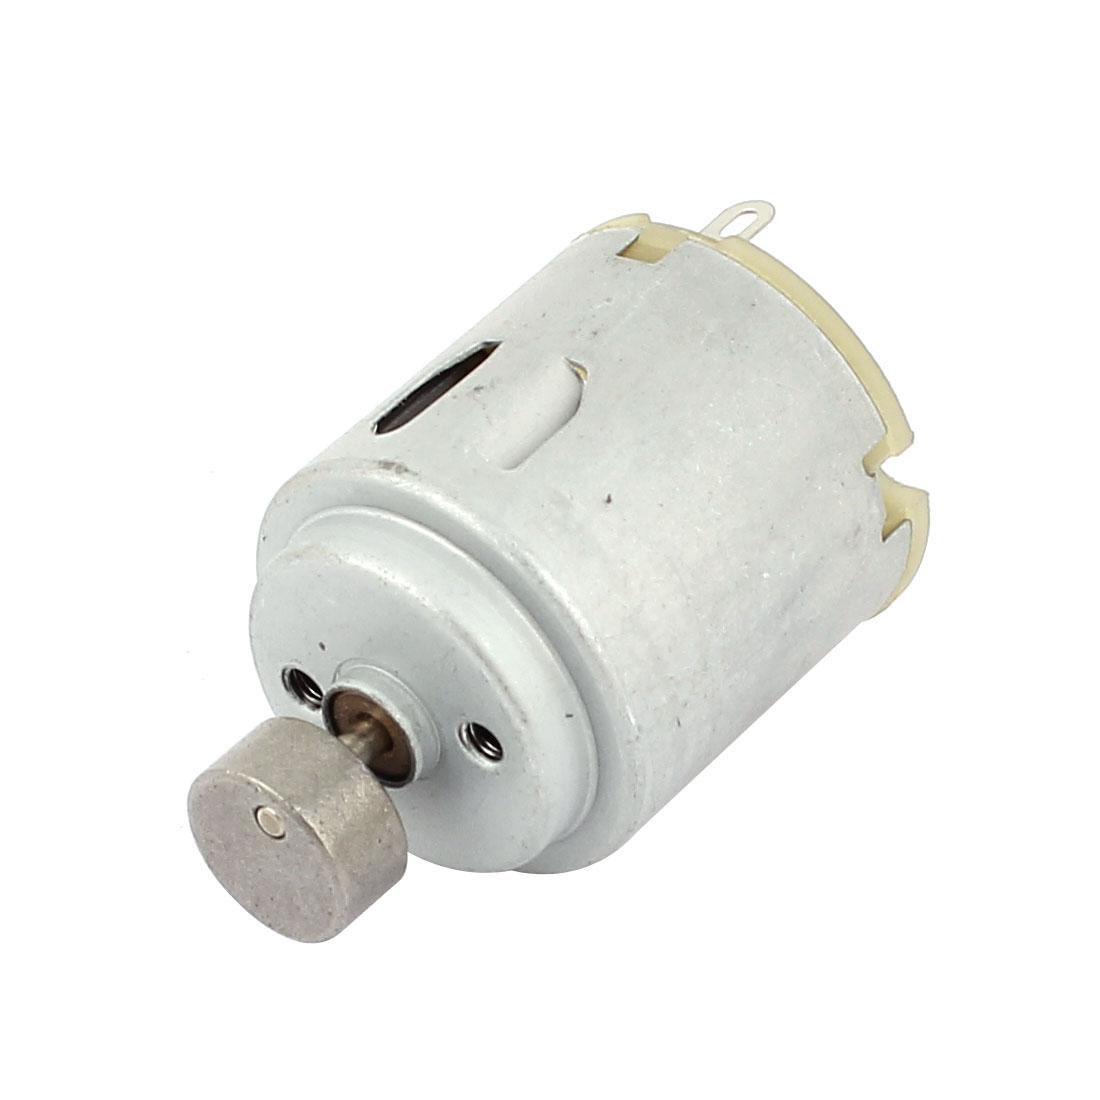 DC 6-12V 3000RPM Micro Magnet Vibration Motor R260 for Massager Model